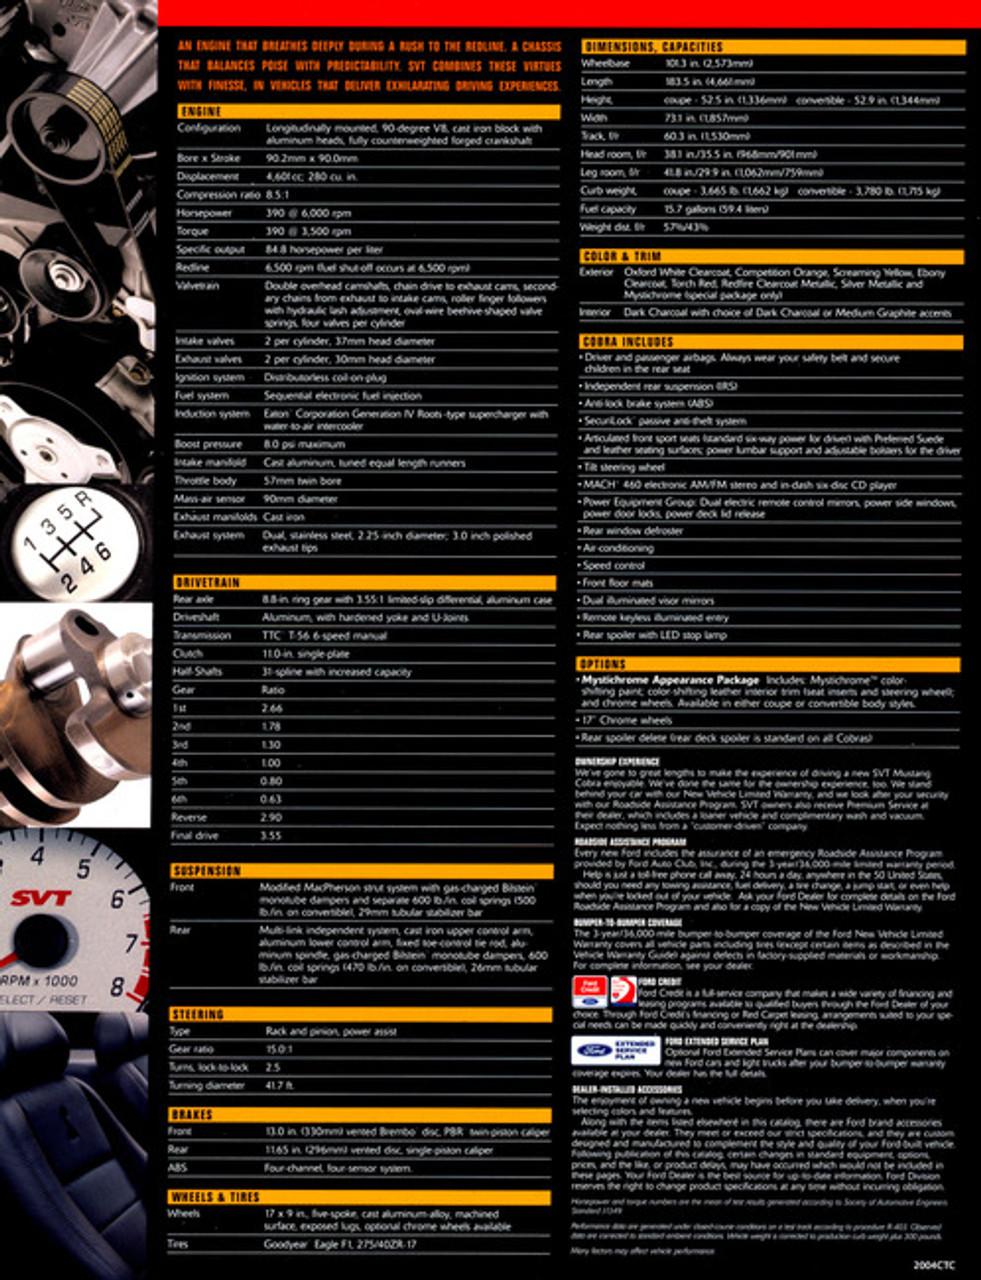 2004 Cobra Tech Card - Set of 2